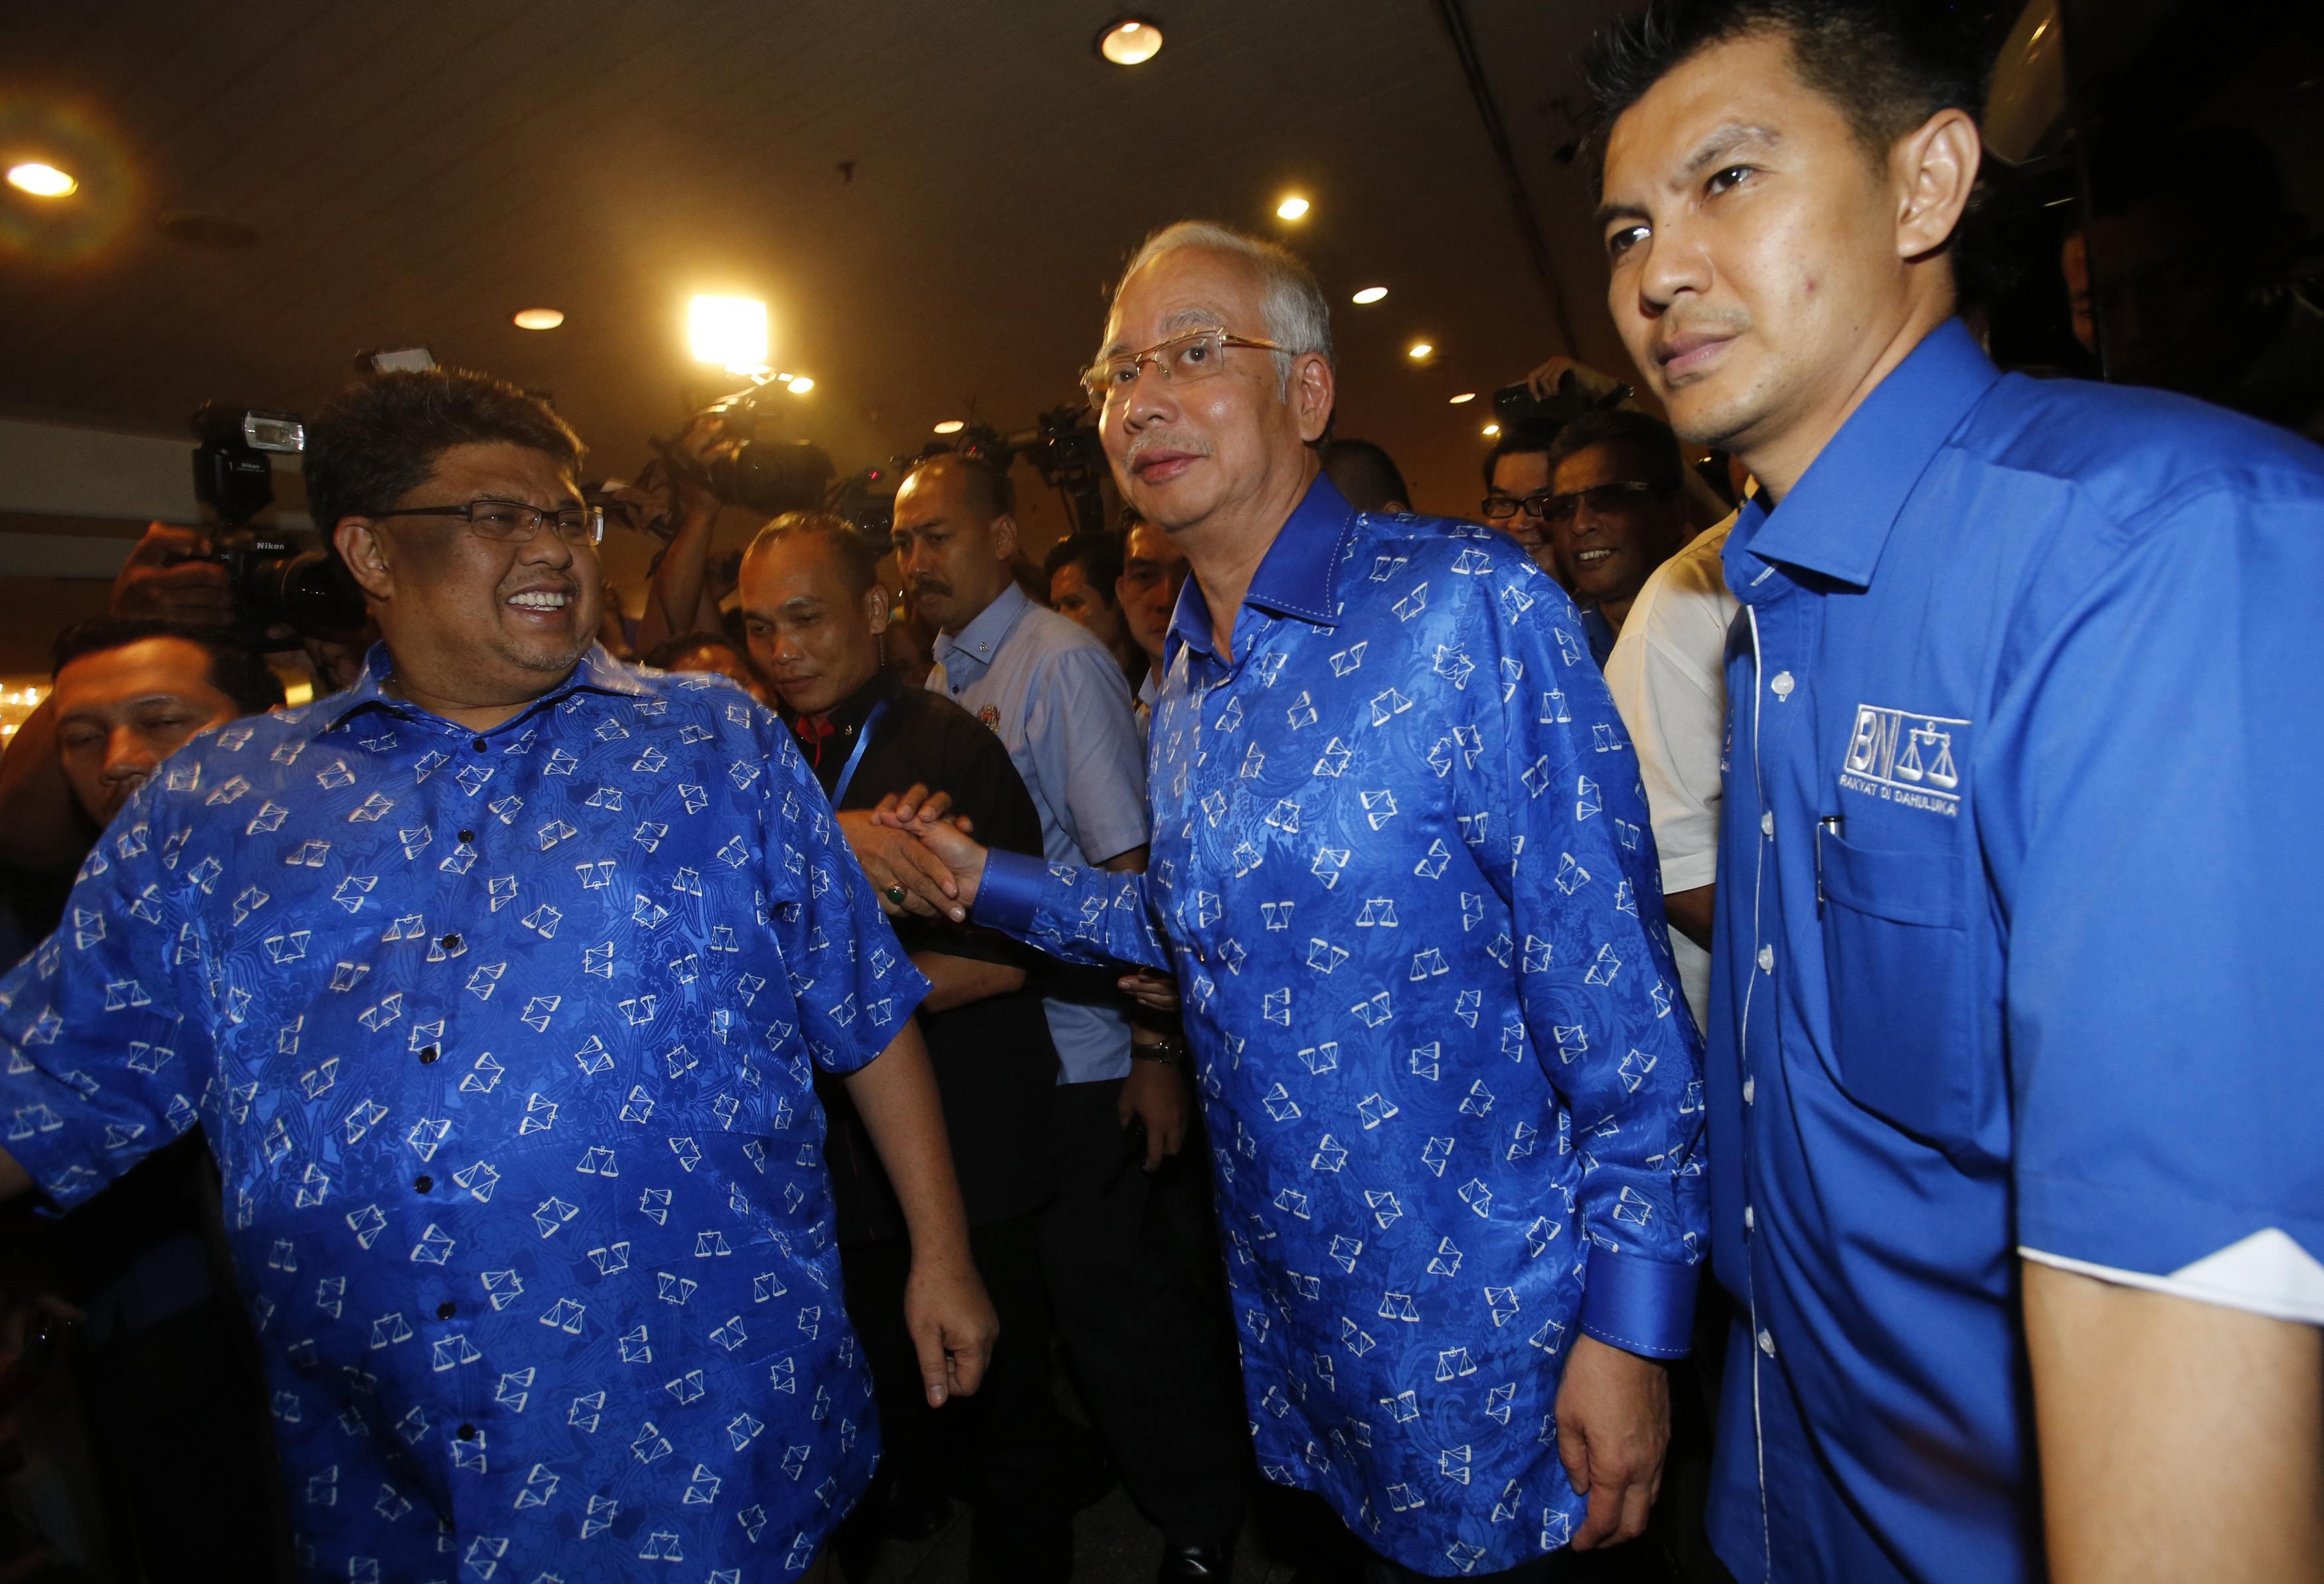 Malaysian regime wins polls, Anwar alleges fraud